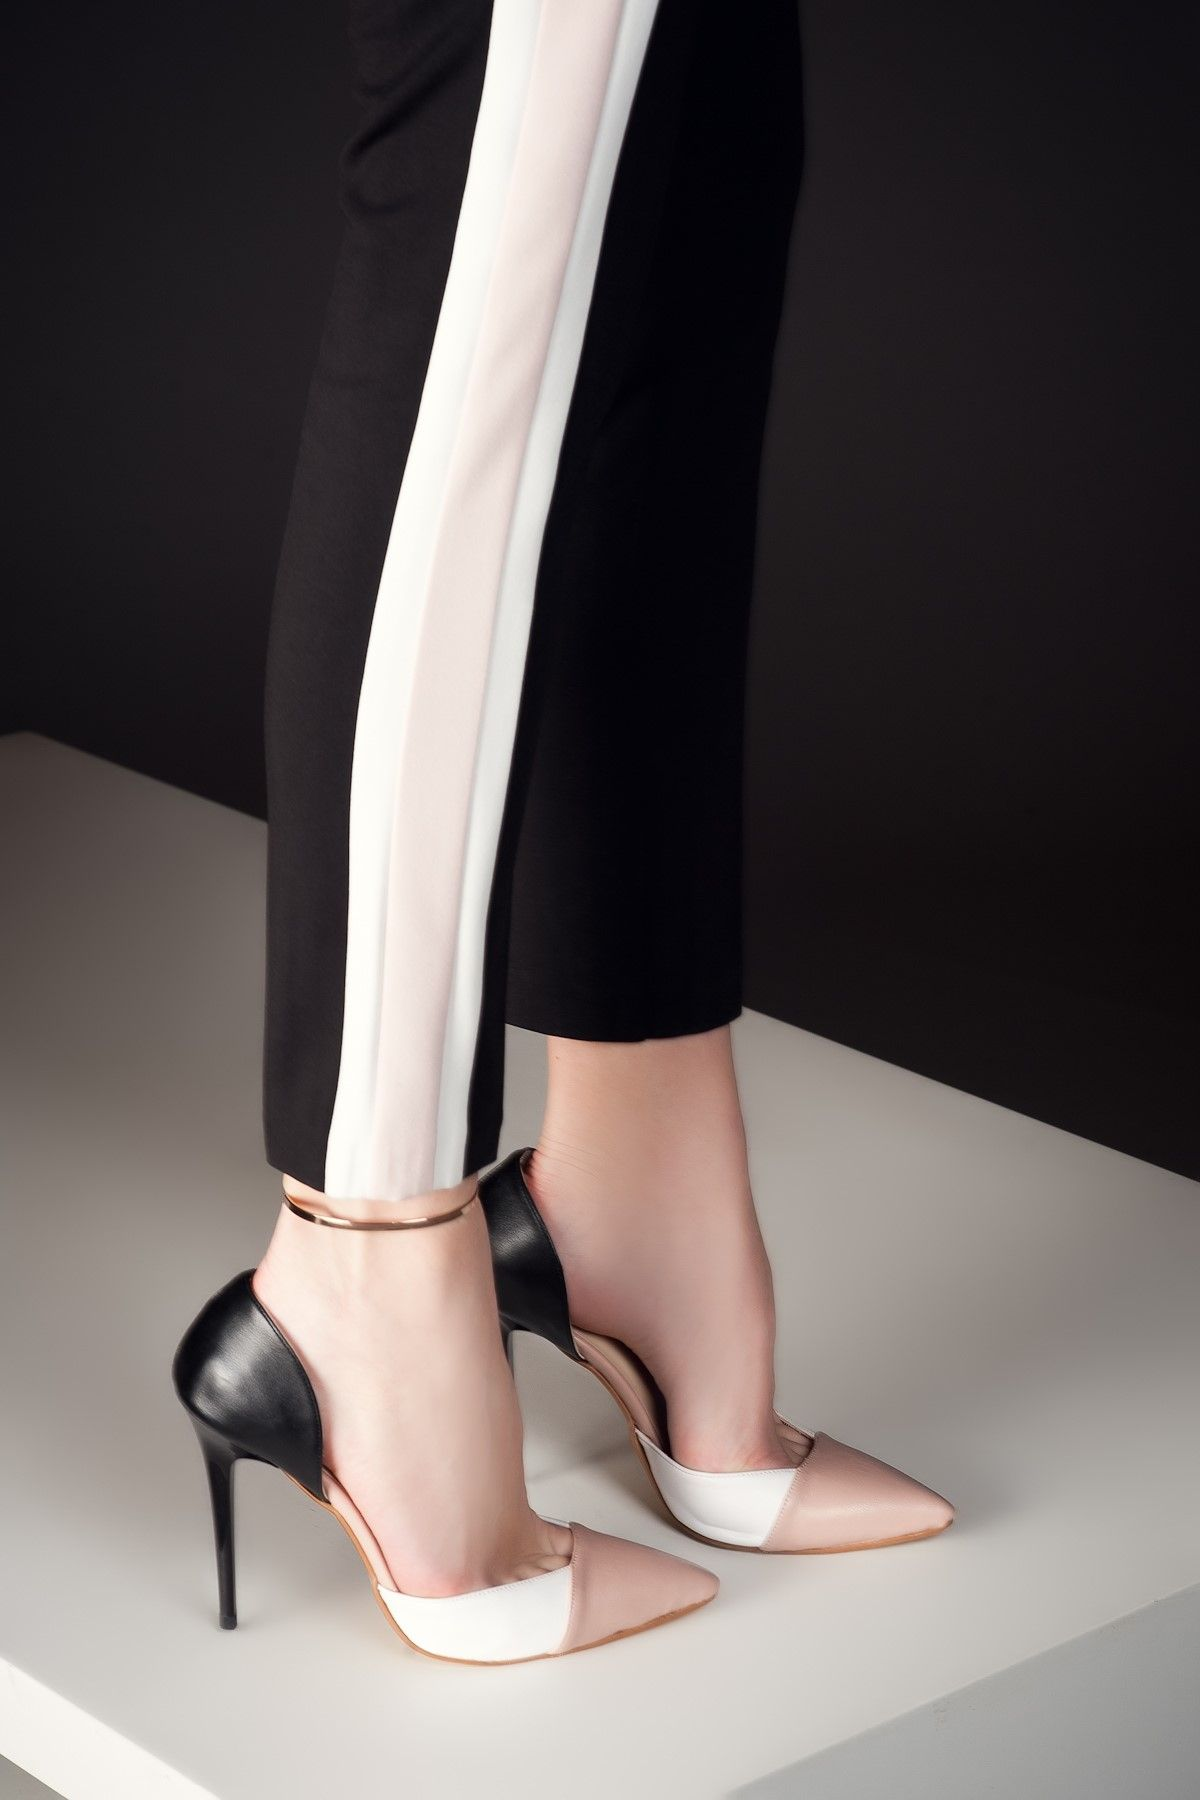 a2ebd4c52ba6 Pudra-Beyaz-Siyah Topuklu Ayakkabı 1633 Milla by trendyol | Trendyol ...